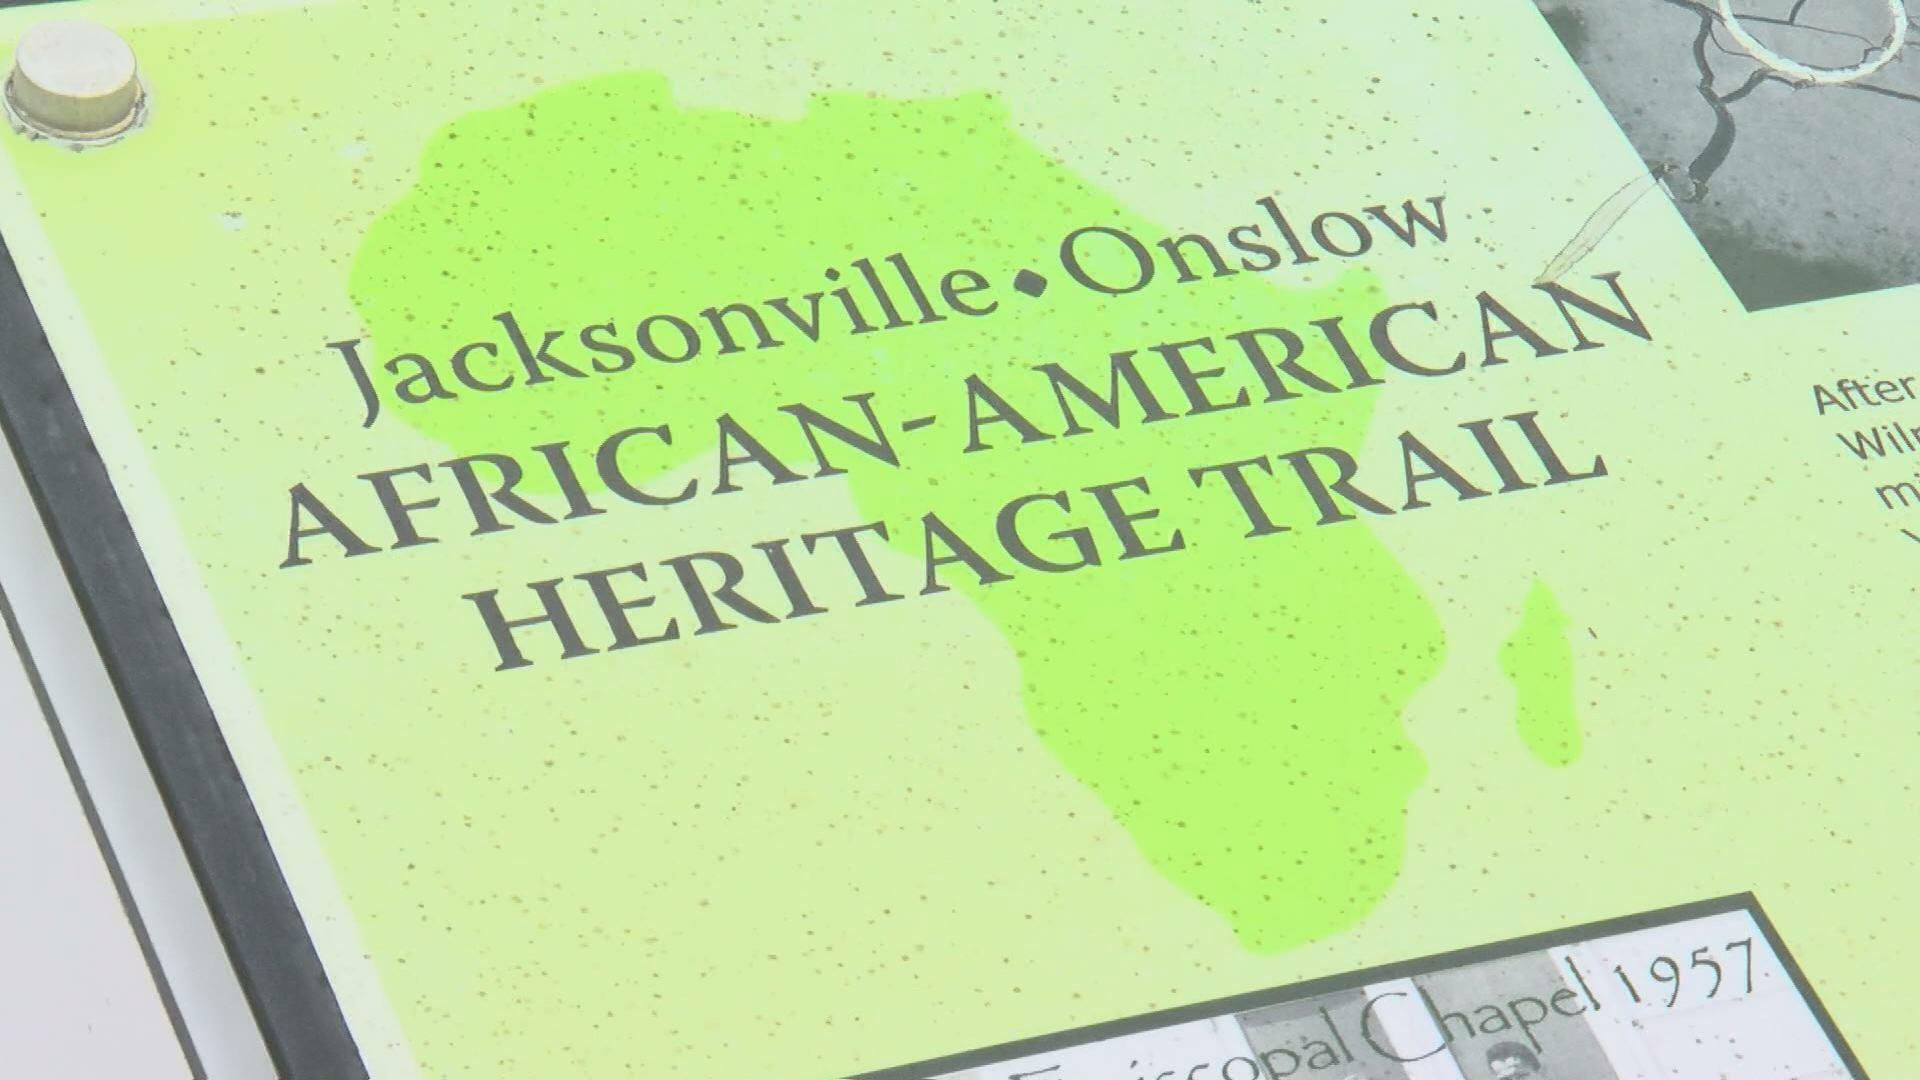 JACKSONVILLE-ONSLOW AFRICAN AMERICAN HERITAGE TRAIL - STILL_1550348437761.jpg.jpg